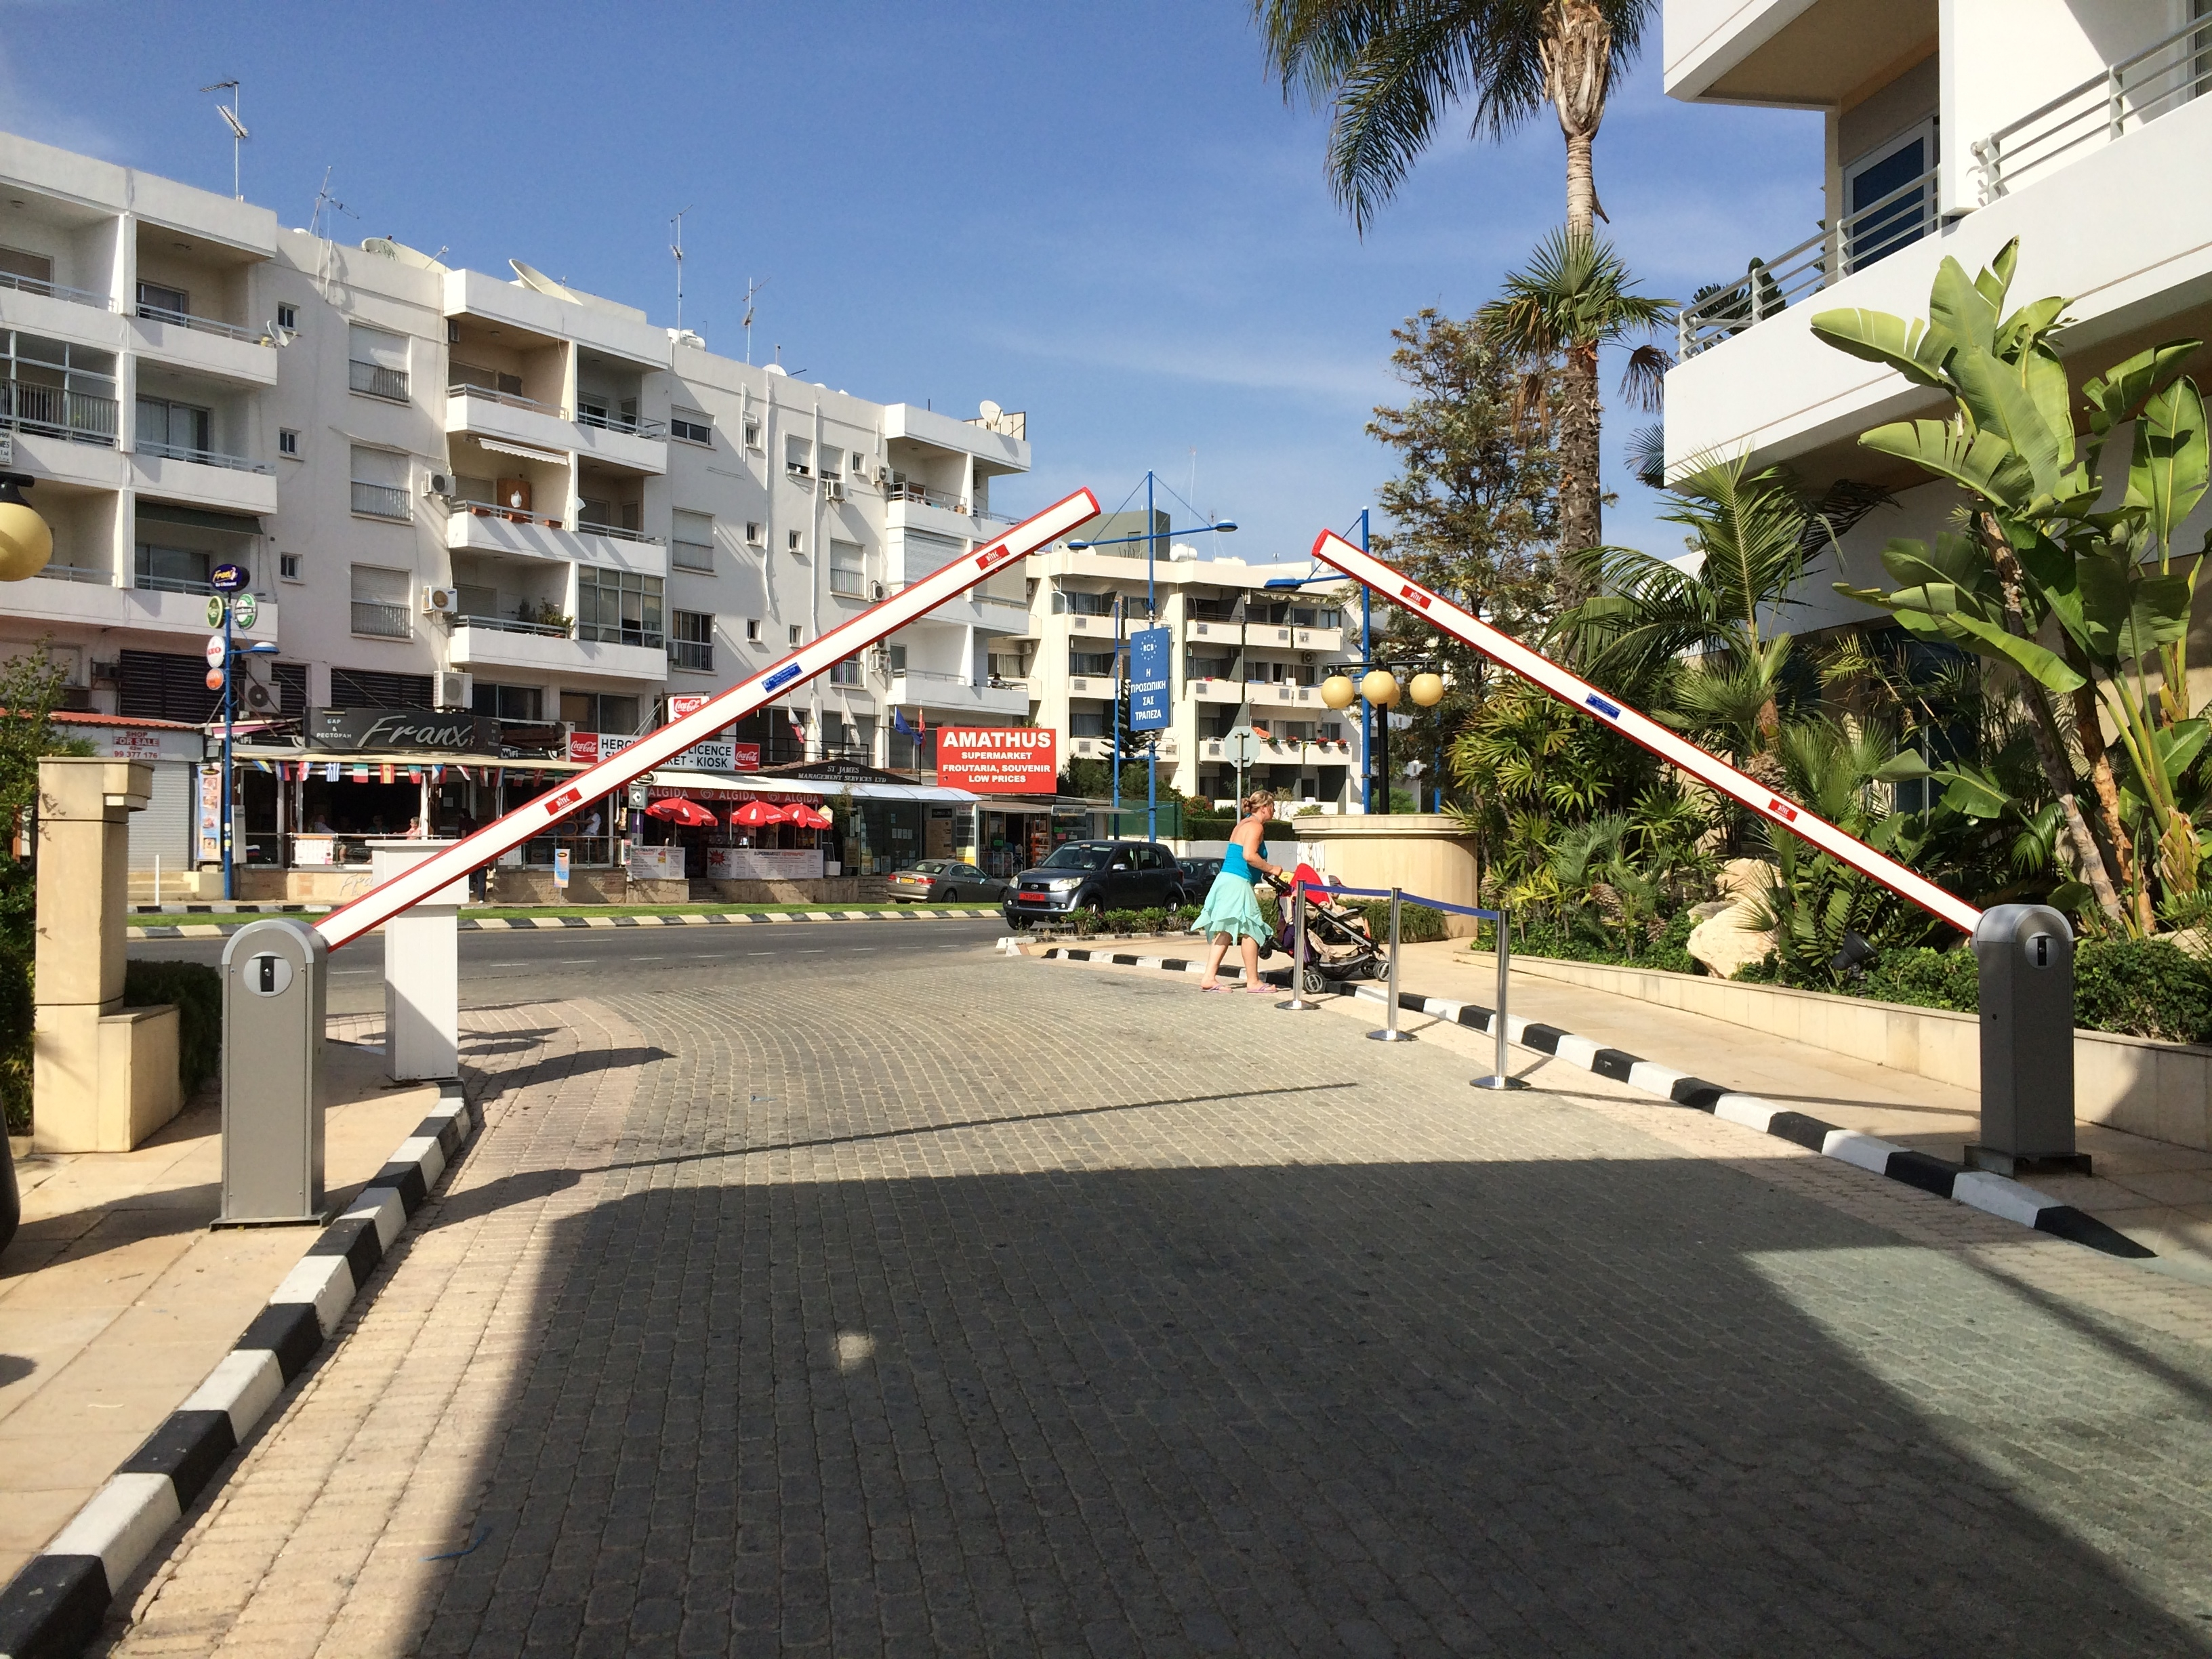 Ditec-QIK7EH Parking Barrier